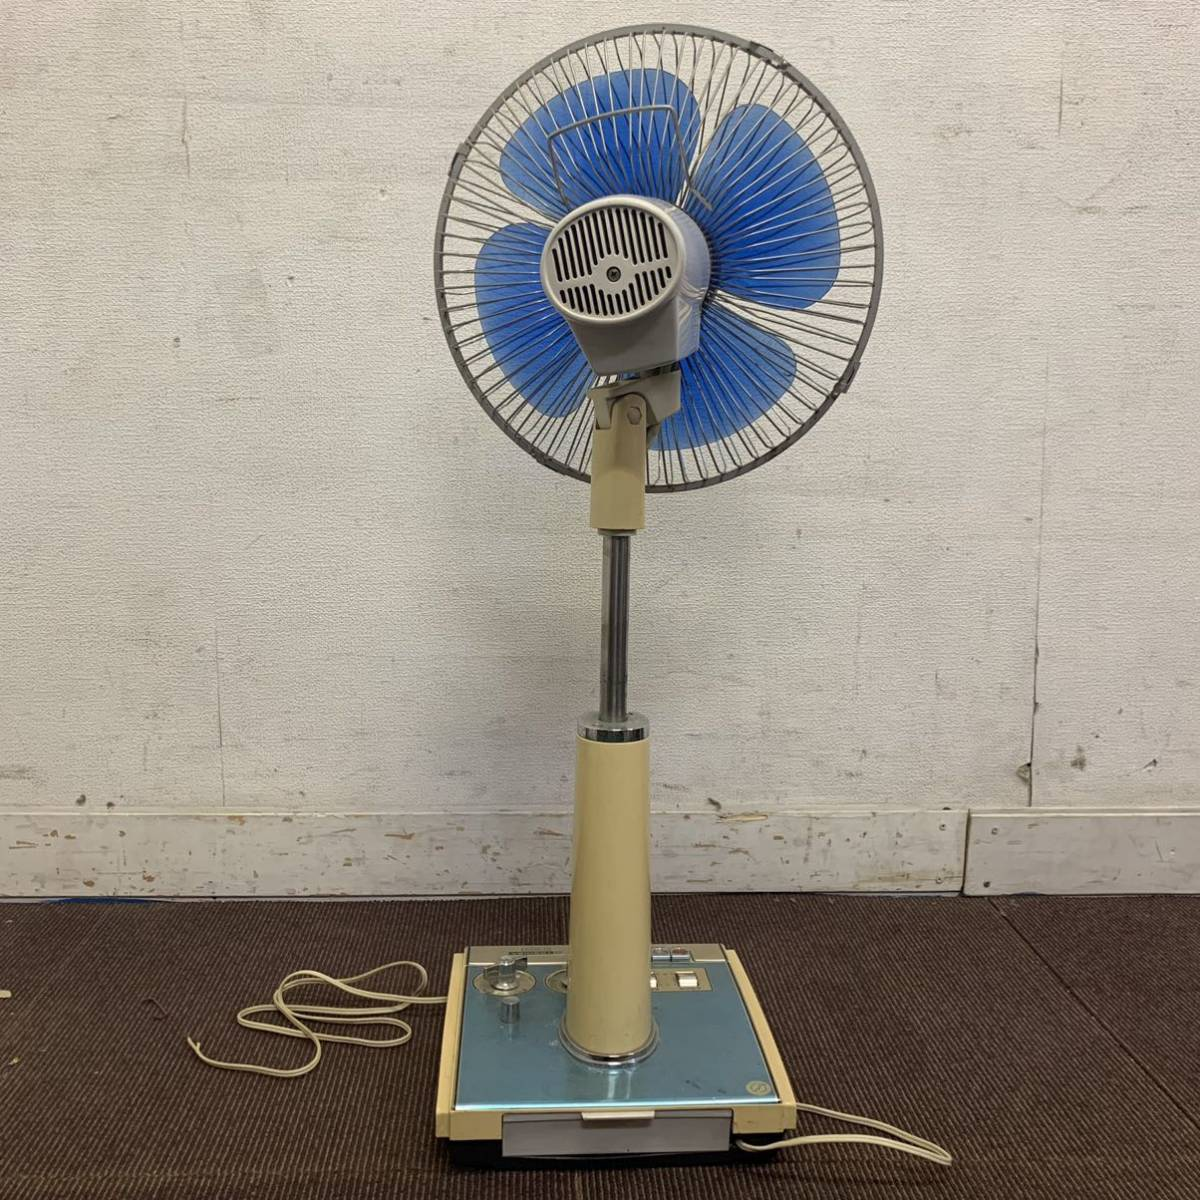 TOSHIBA 扇風機 H-30DL 昭和レトロ 東芝扇風機 レトロ扇風機 アンティーク ジャンク 格安売り切りスタート #_画像3